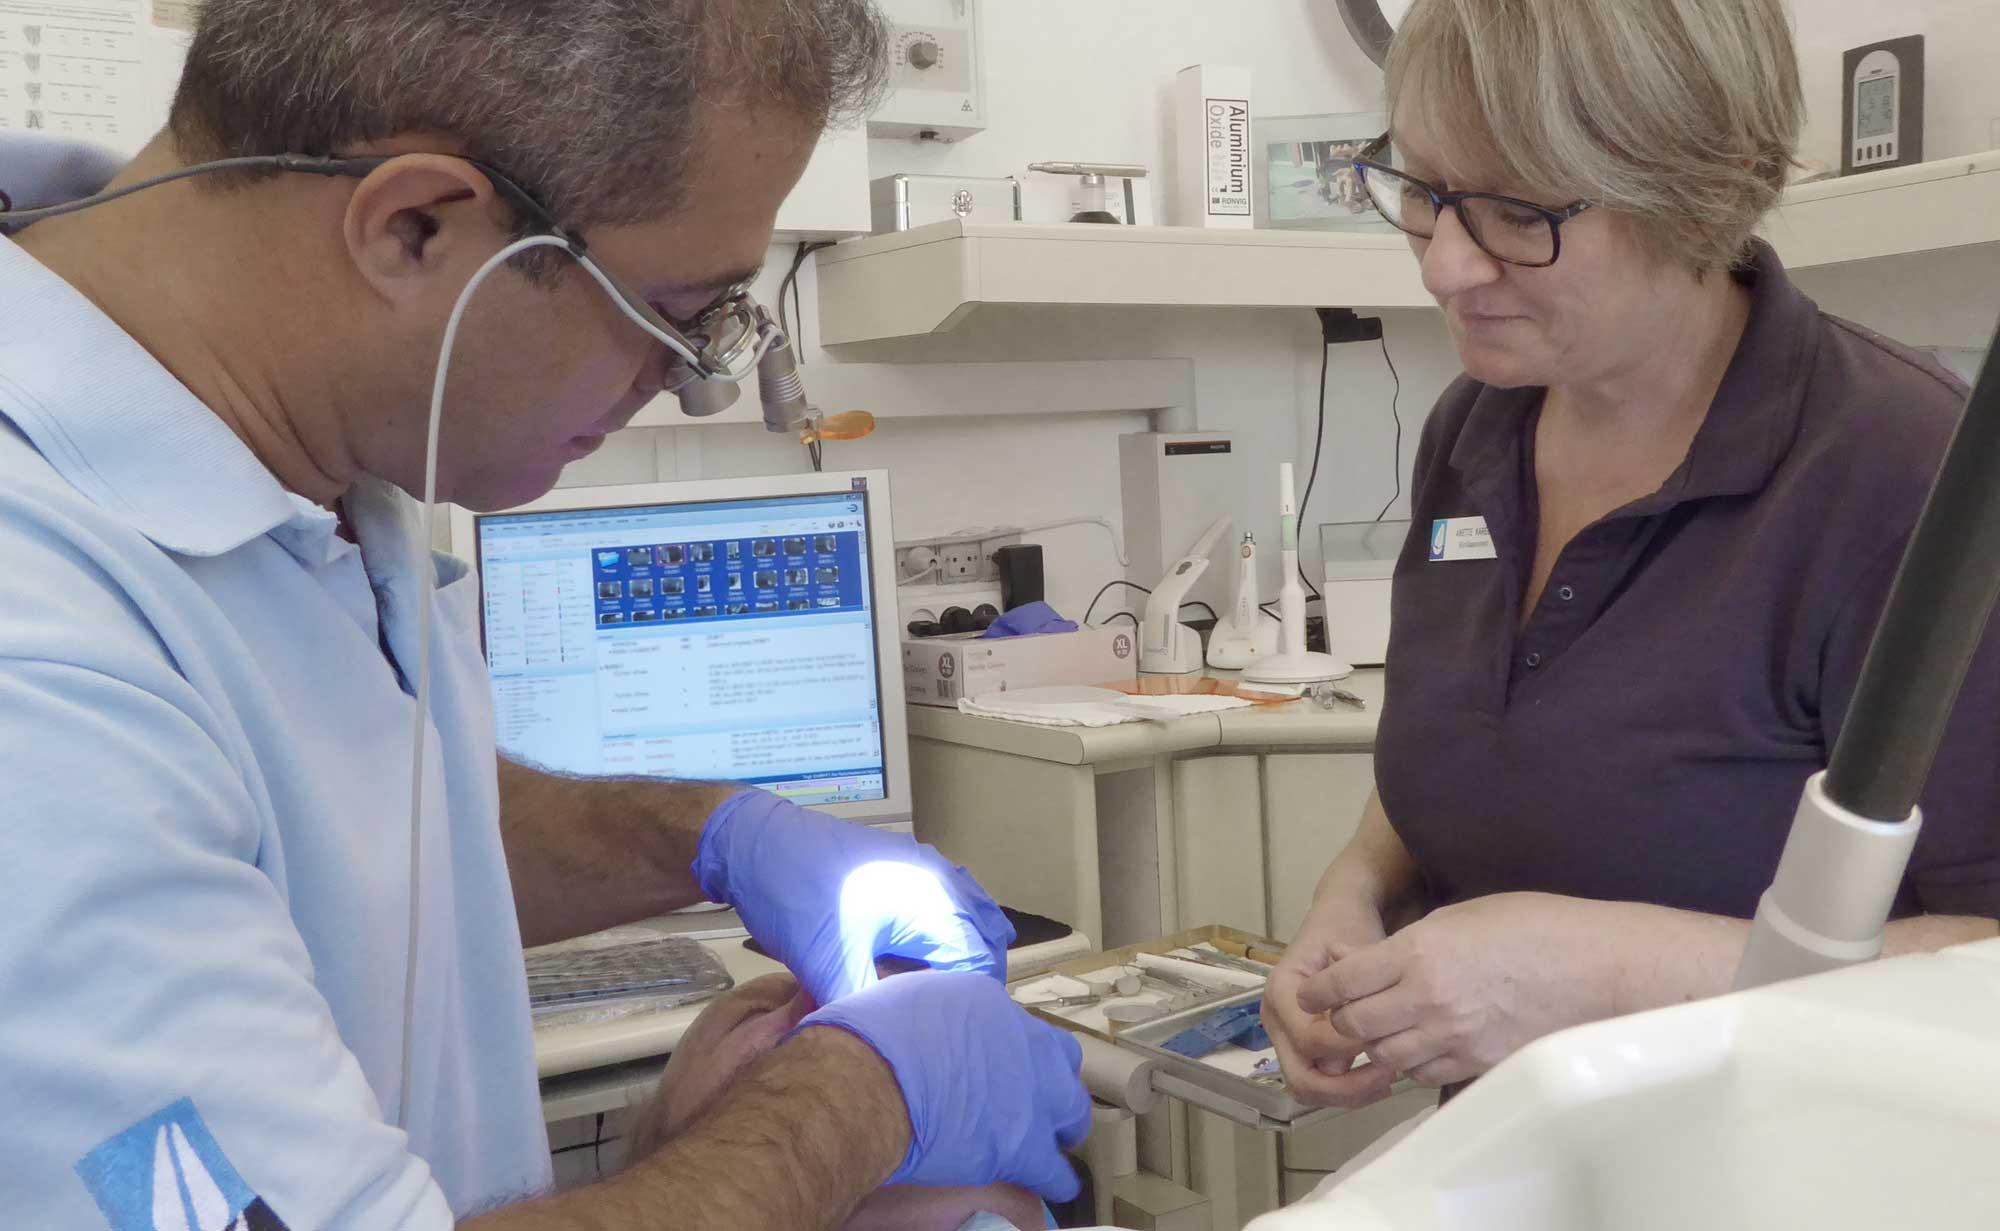 Tandeftersyn / tandrensning med ultralyd